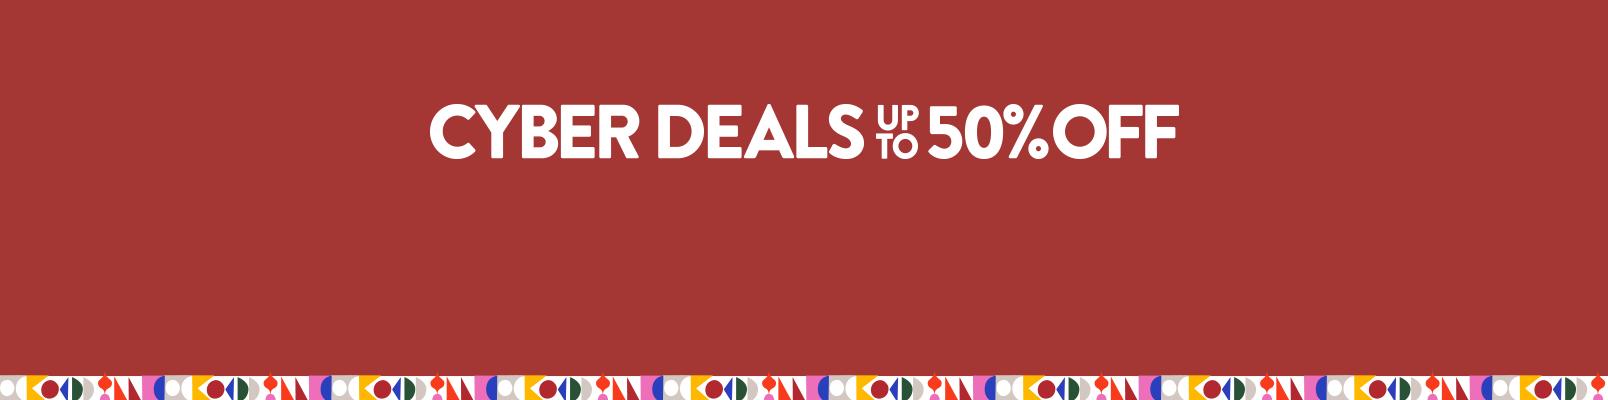 deals on shoes online